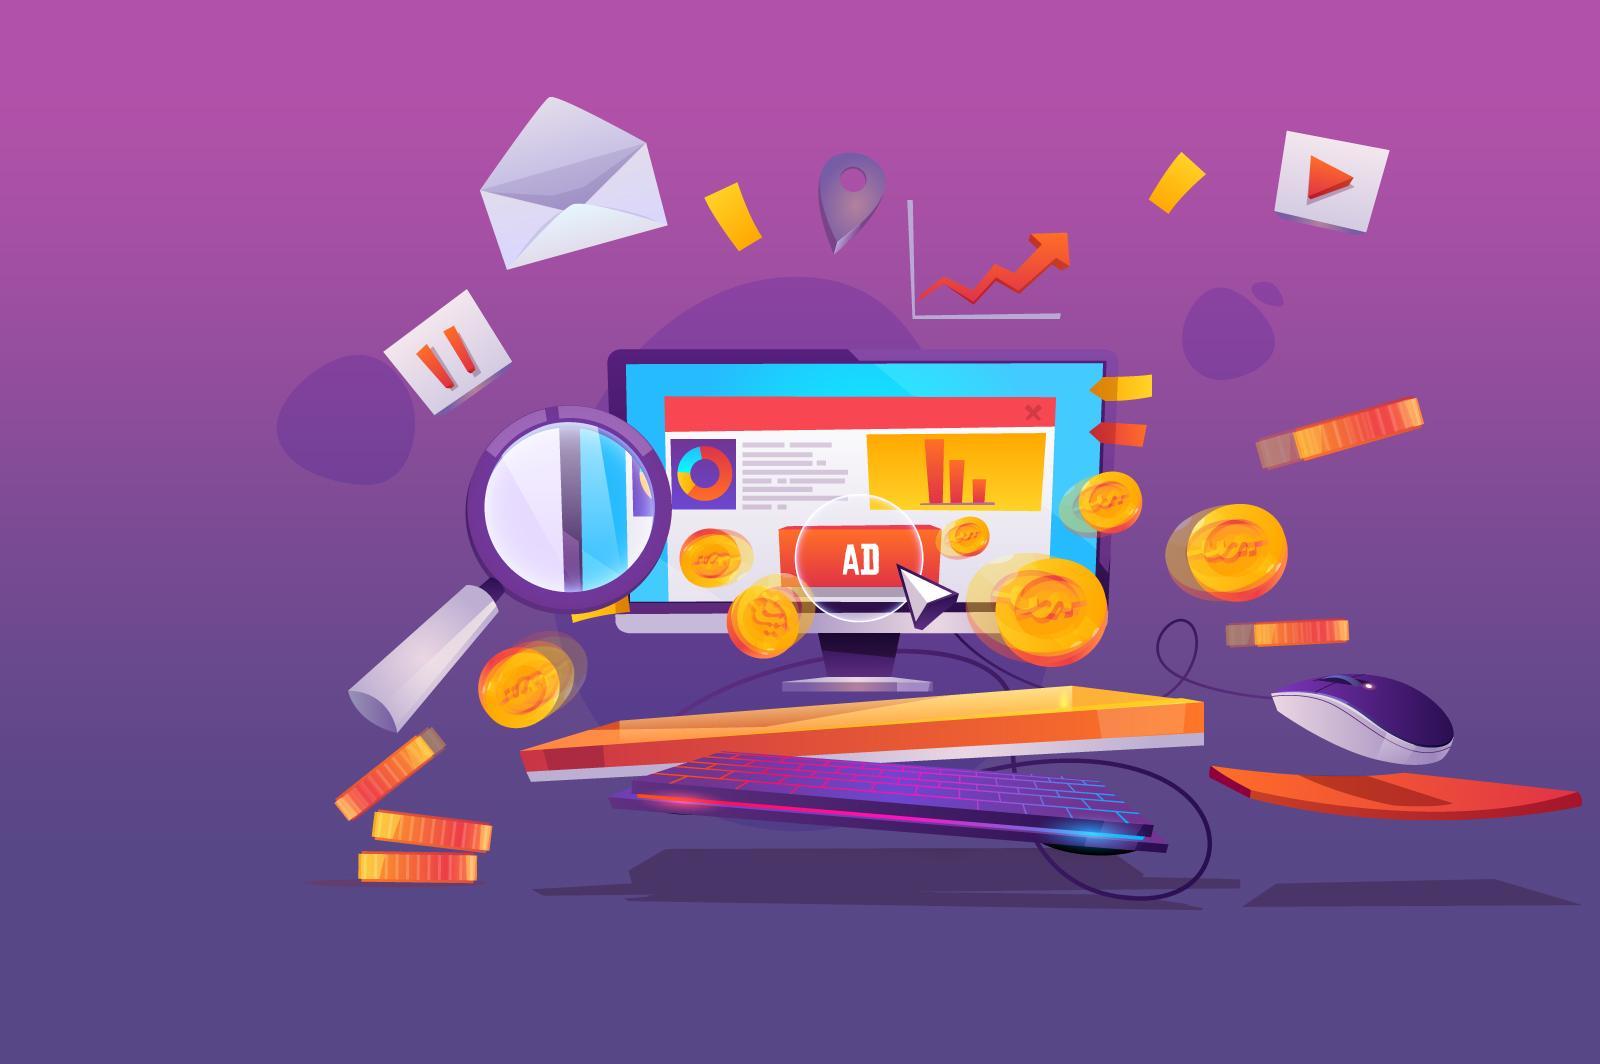 Шпаргалка по Google Ads: сколько стоит реклама в Гугл